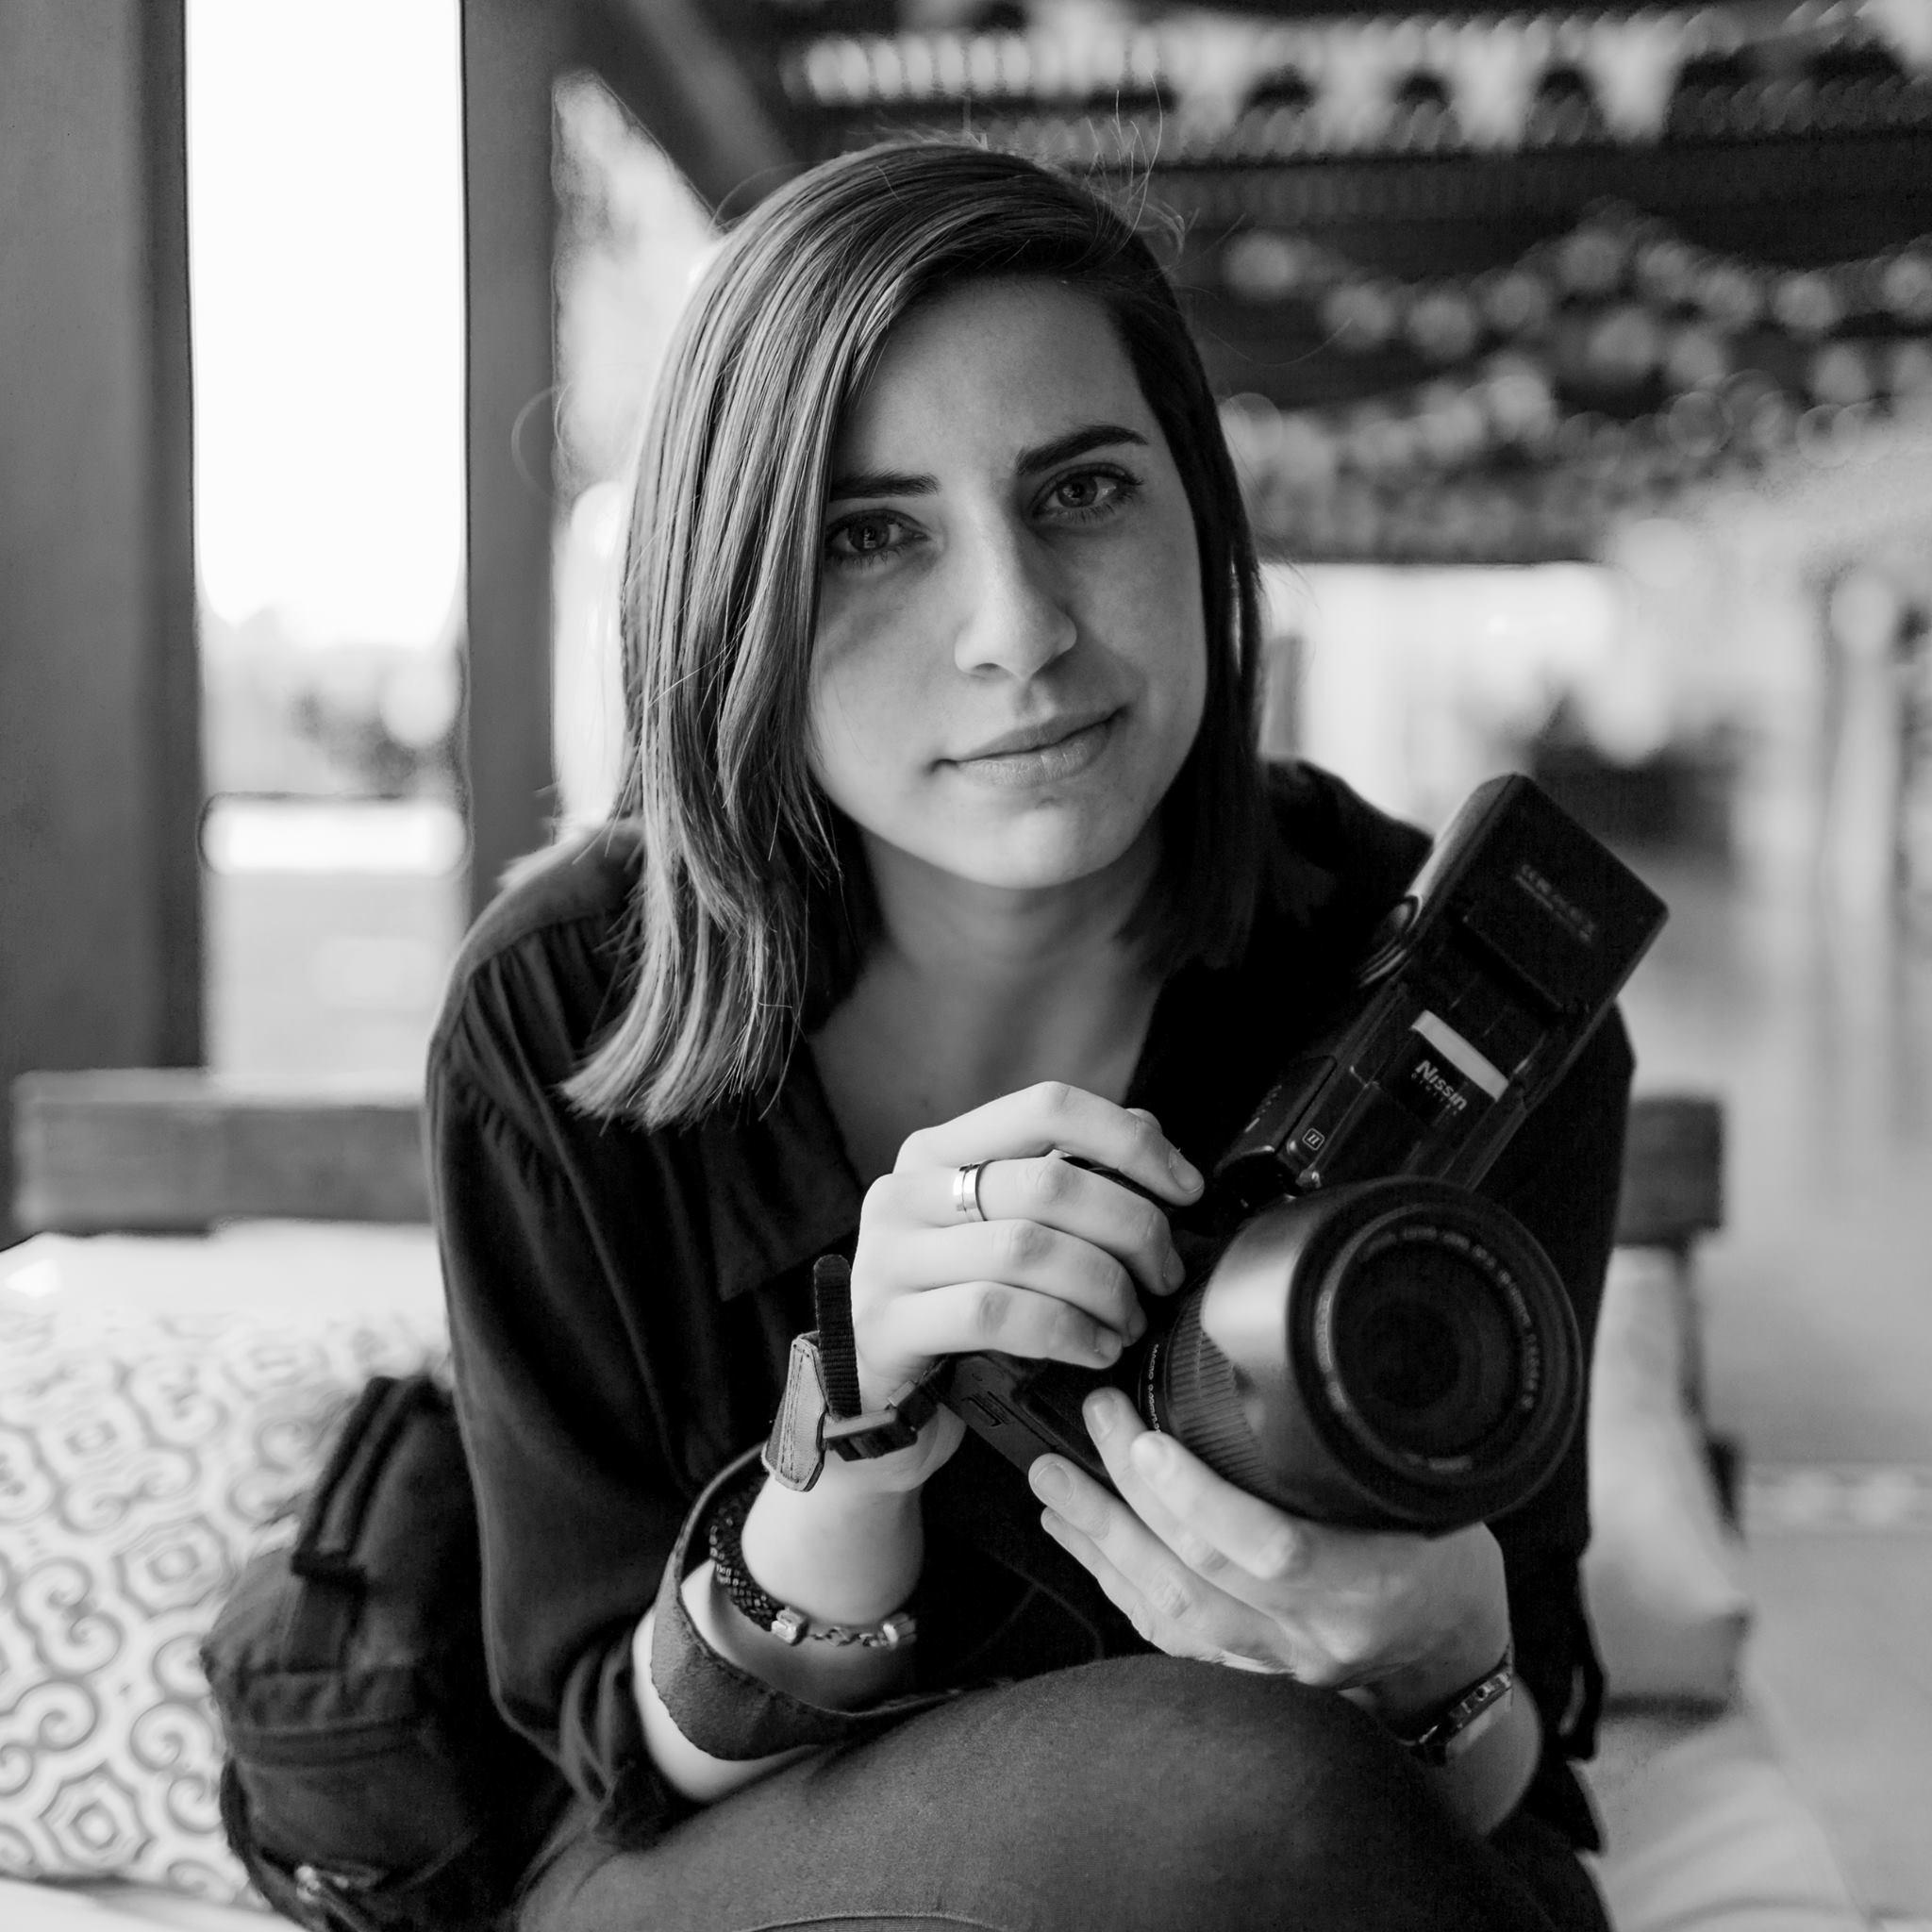 ph/video Melisa Noguera